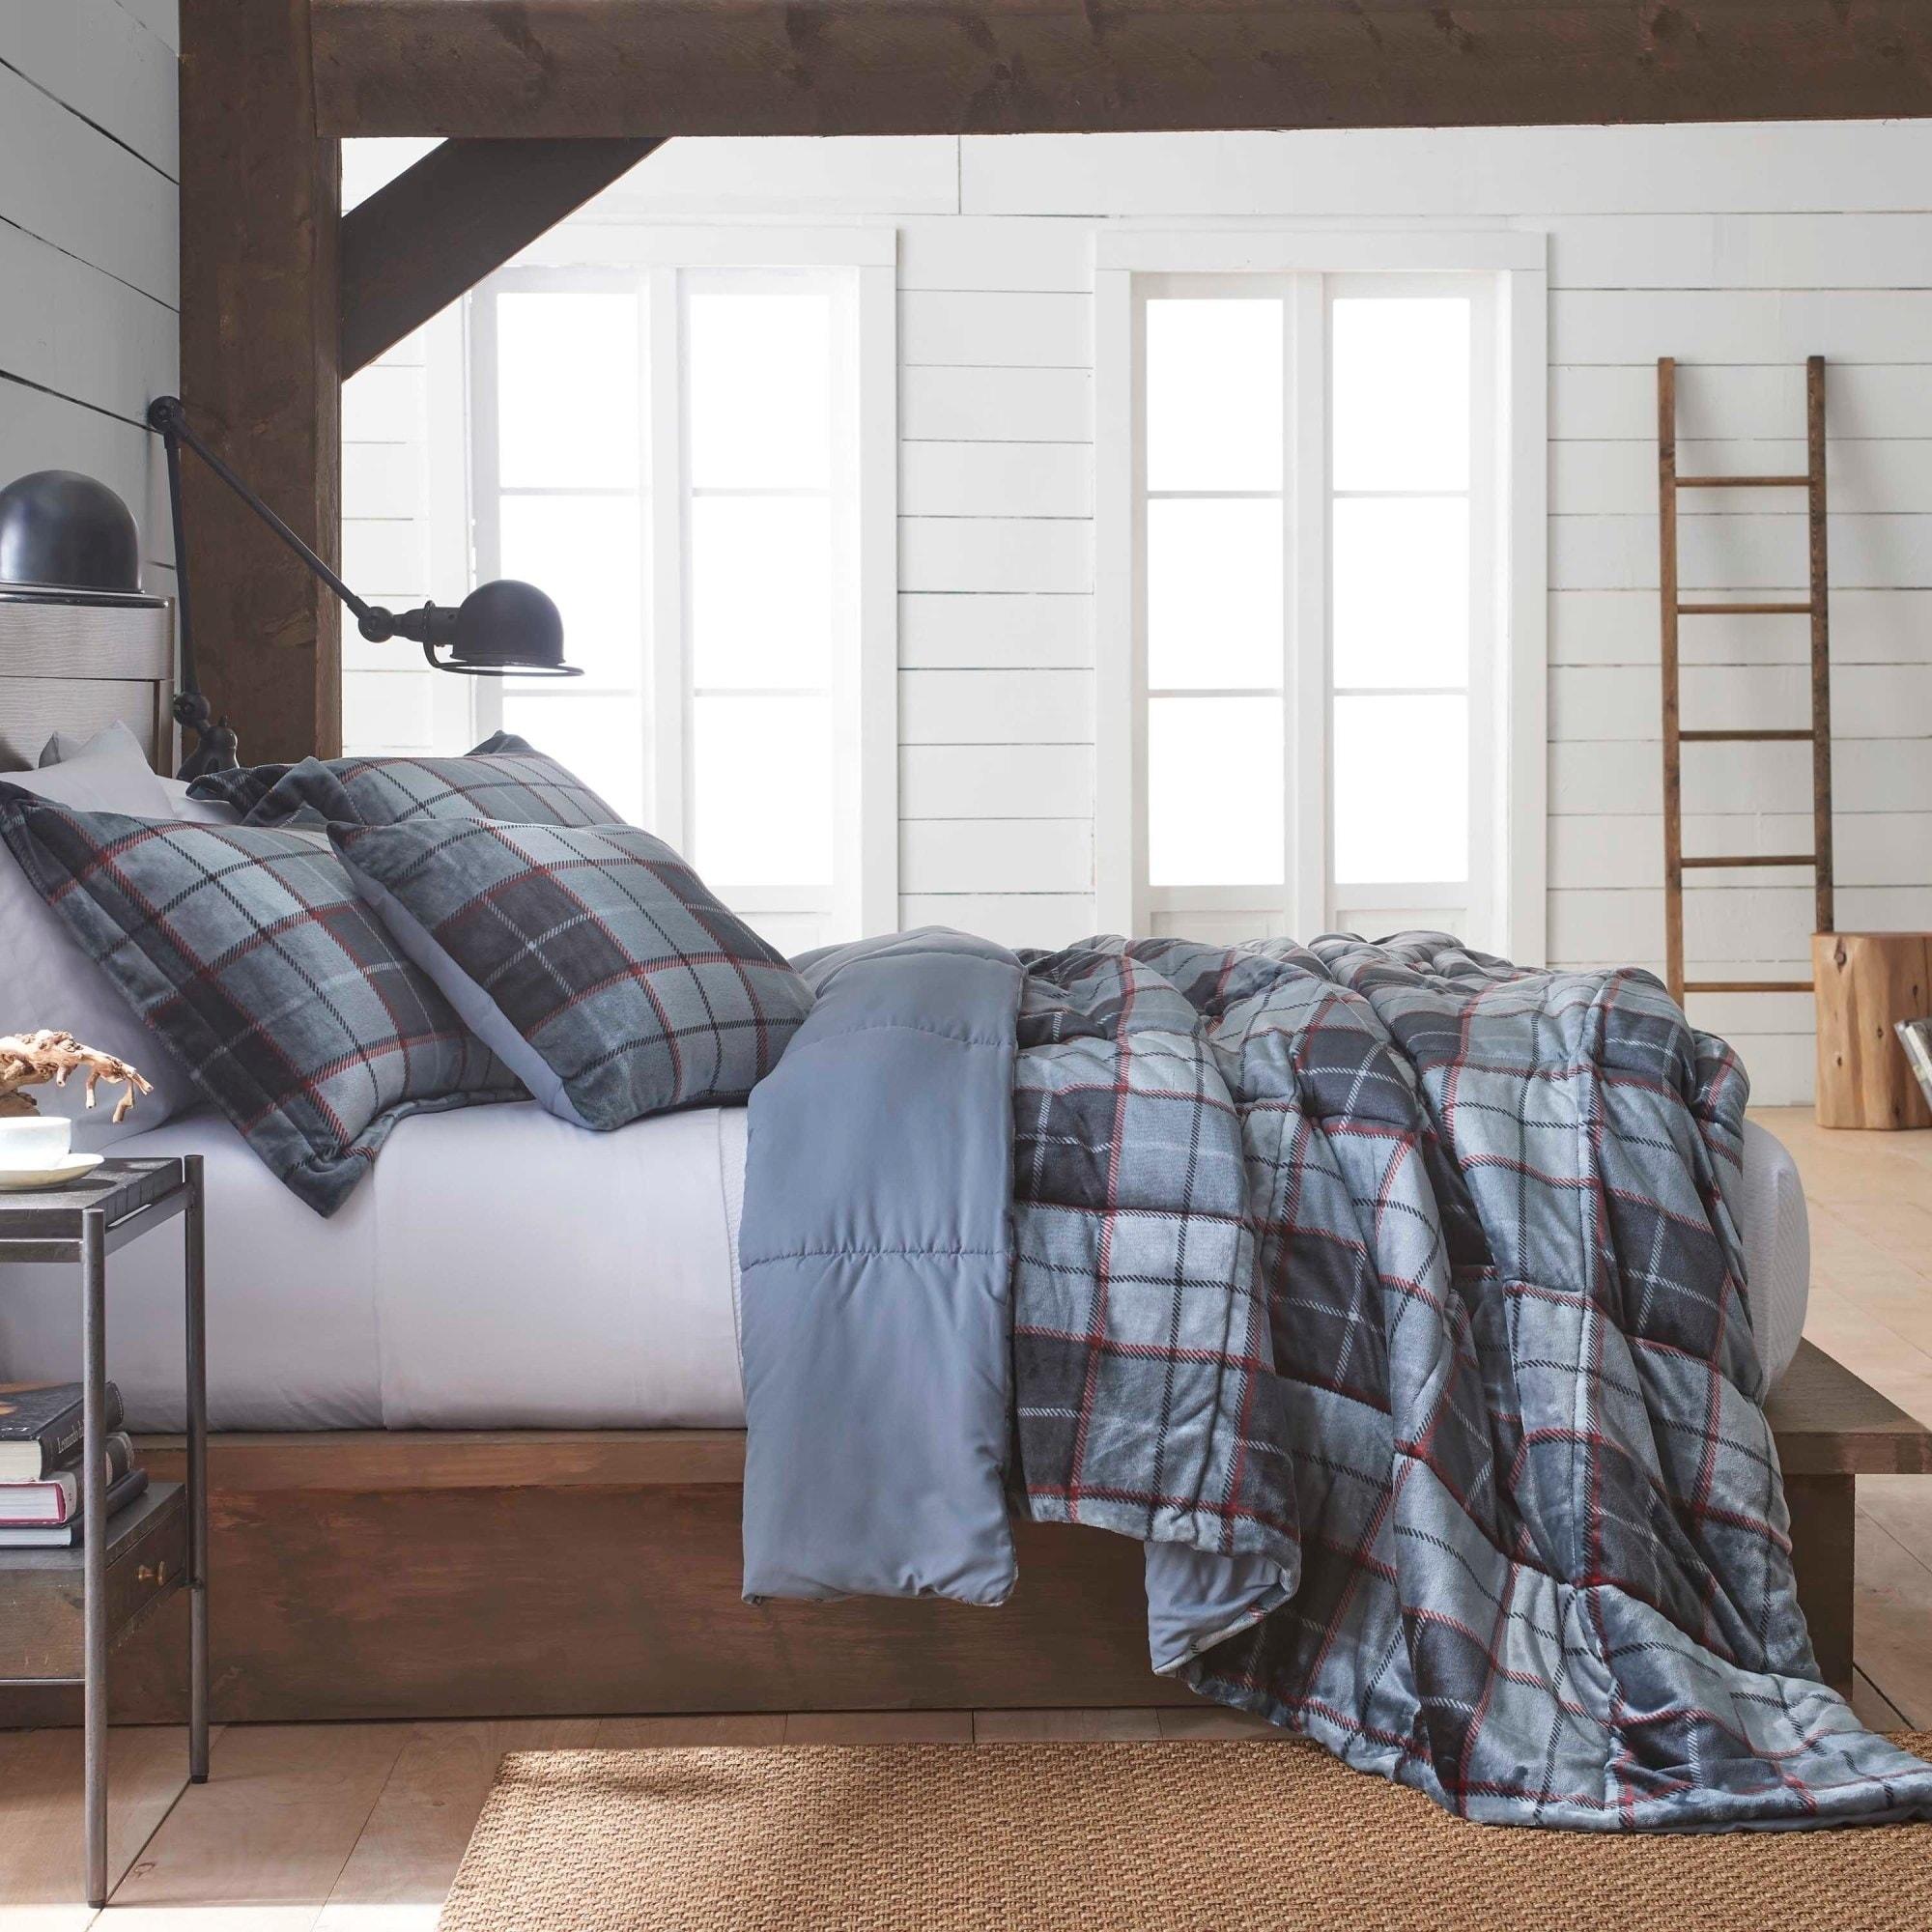 microfiber kitchen comforter ultra room com covers bedding amazon multi duvet home my colored set varsity soft dp plaid full king